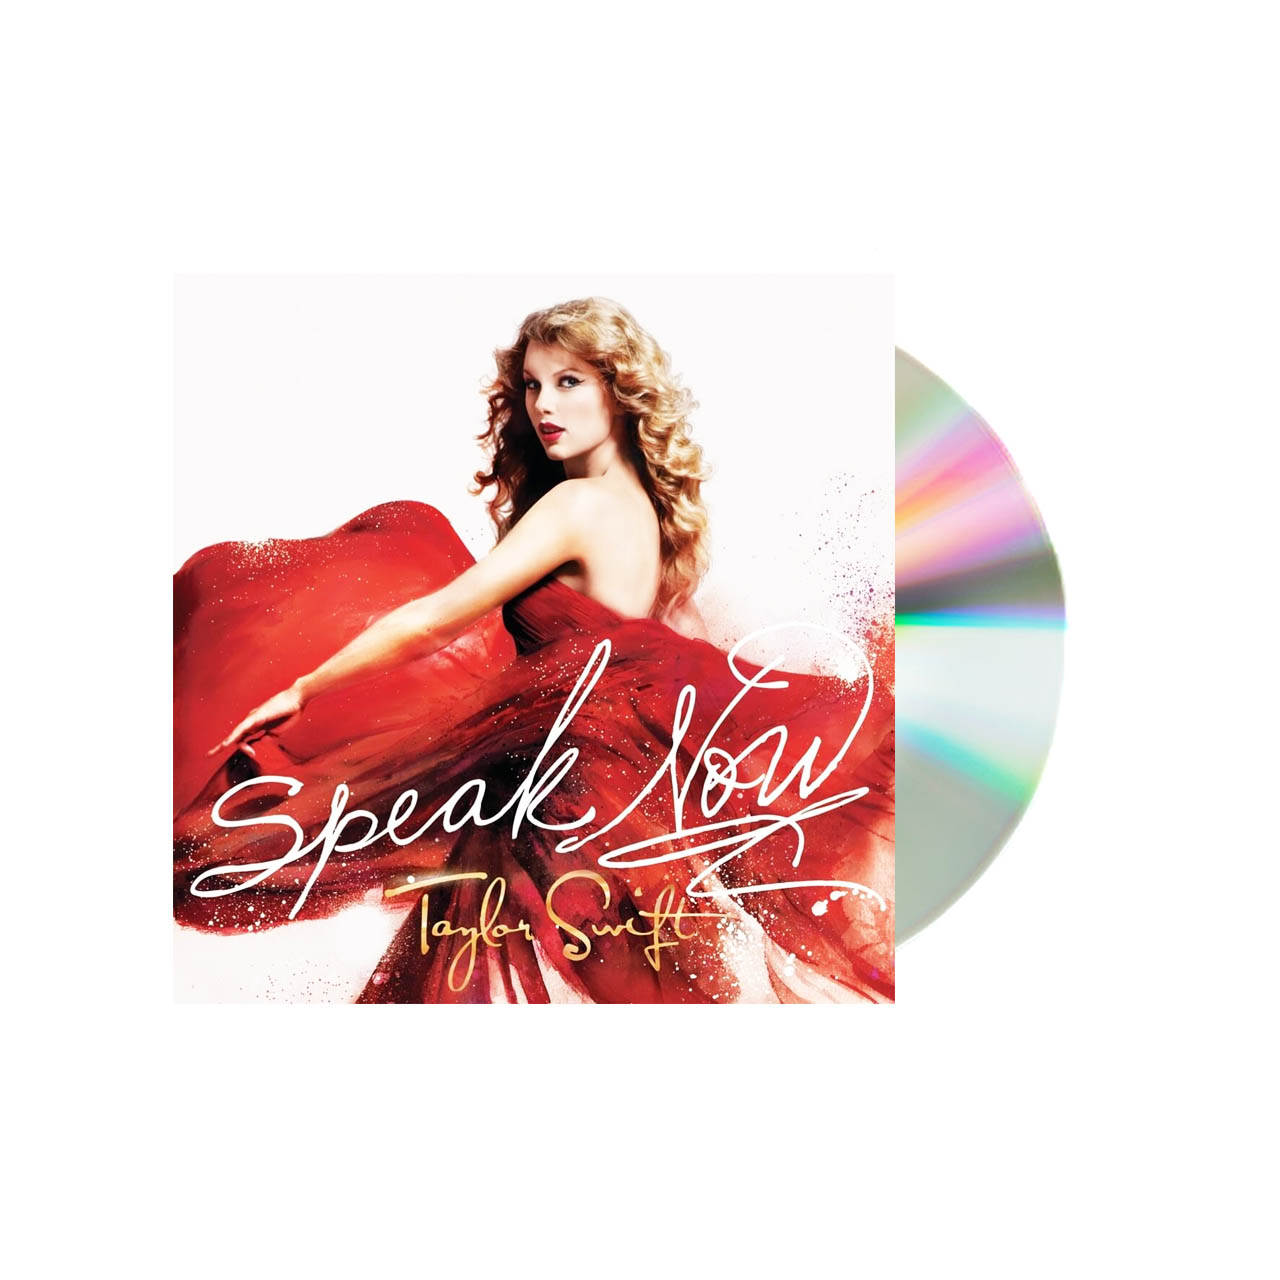 TAYLOR SWIFT Speak Now Deluxe CD